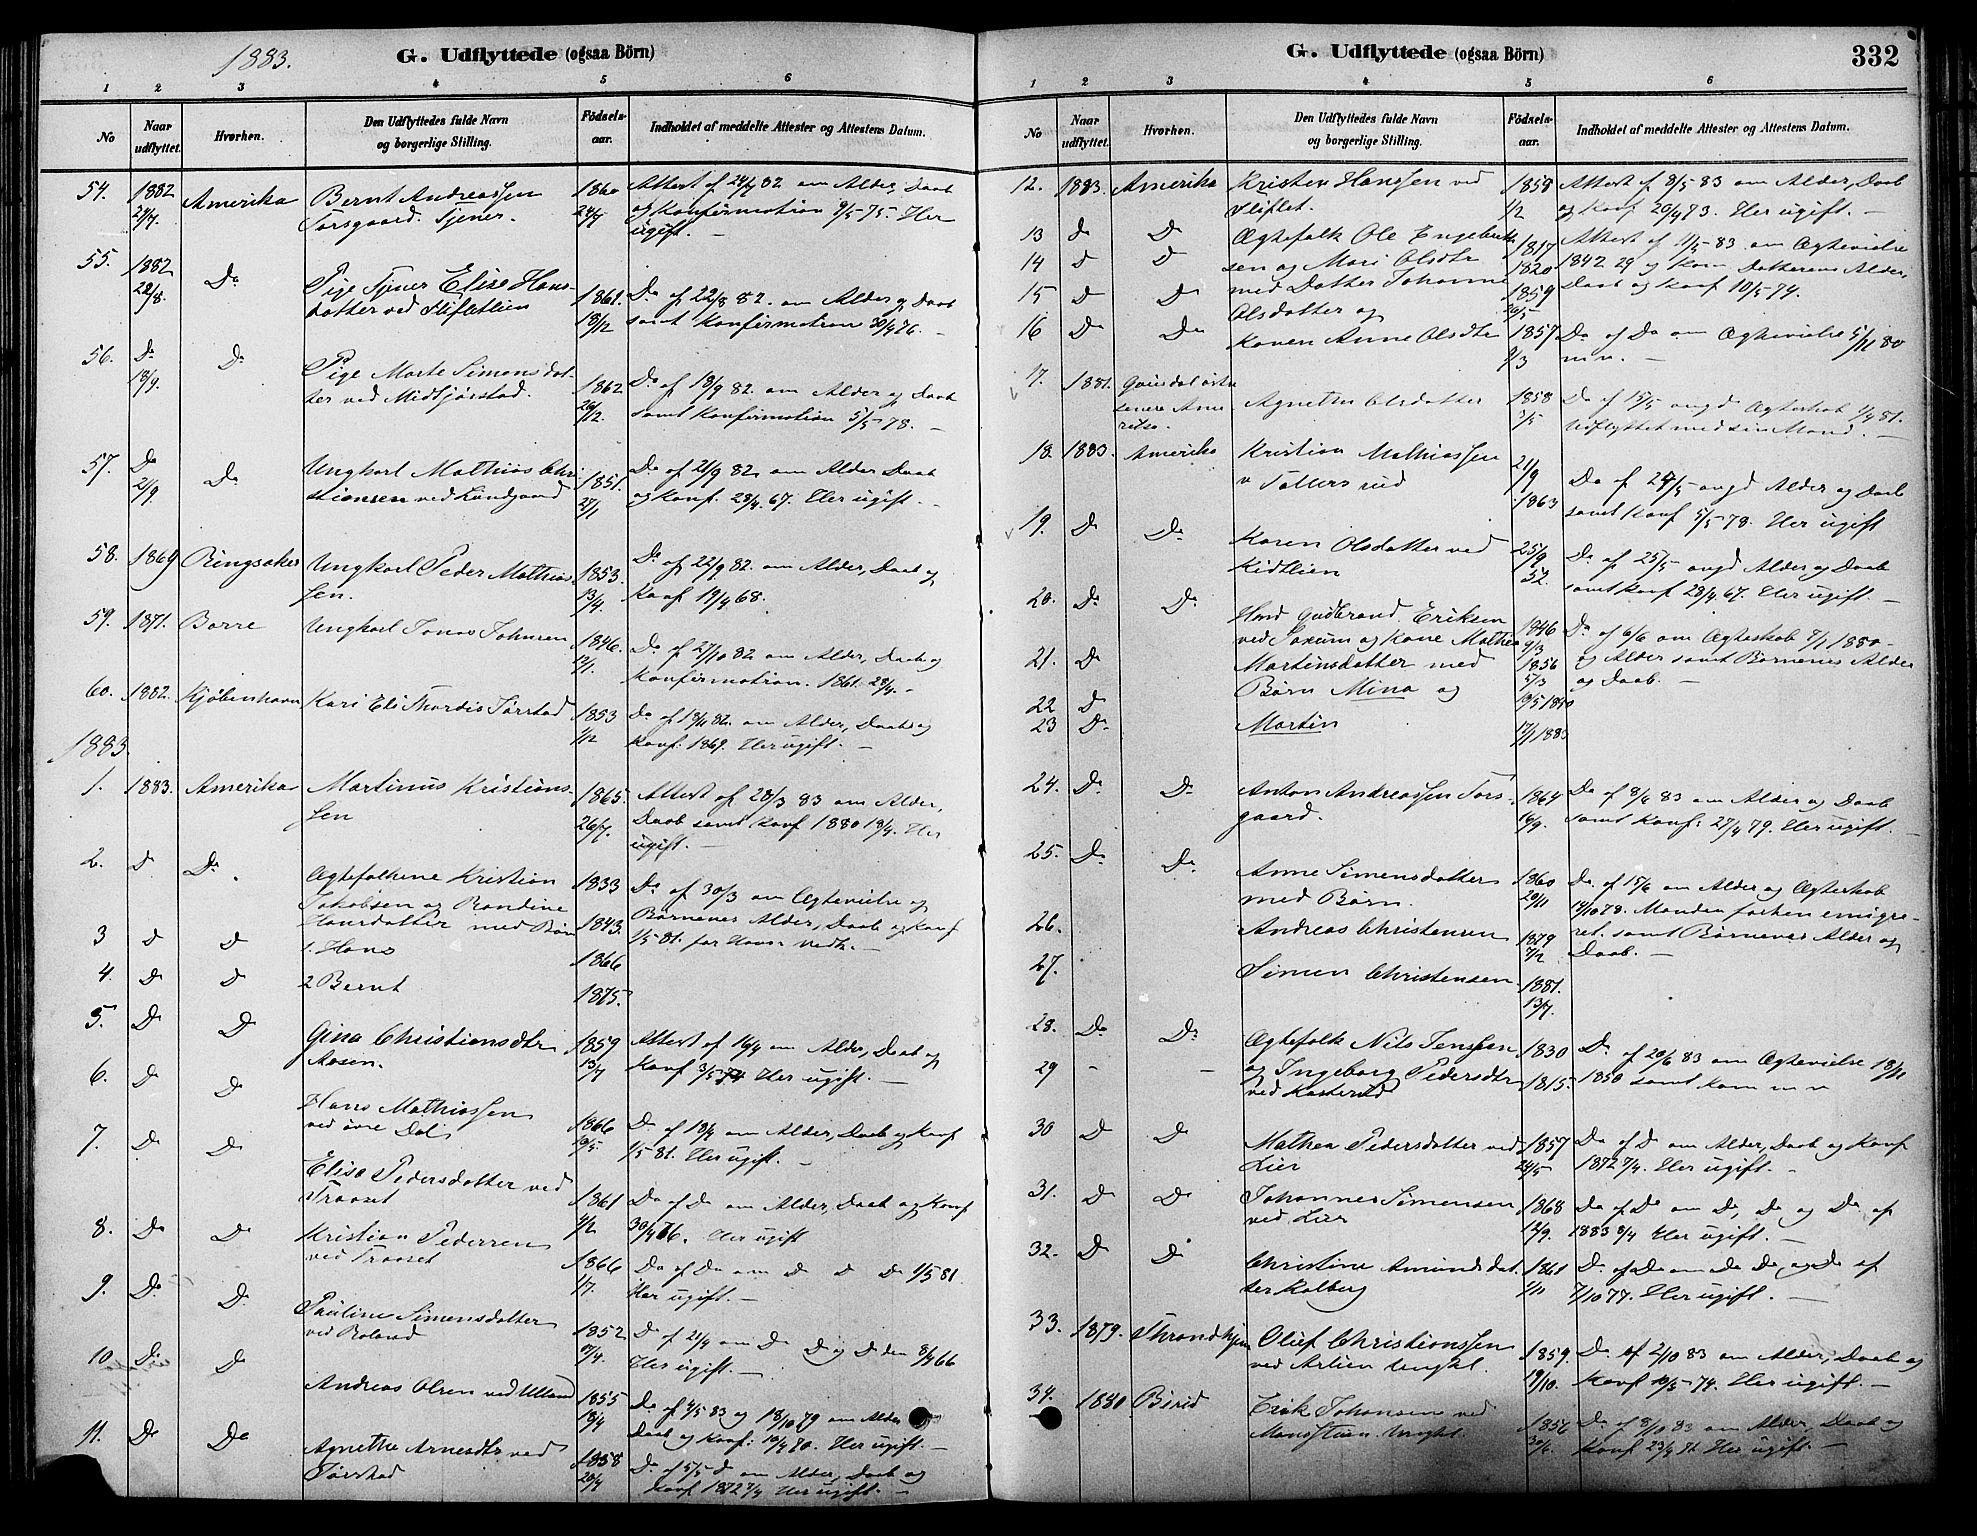 SAH, Fåberg prestekontor, Ministerialbok nr. 8, 1879-1898, s. 332